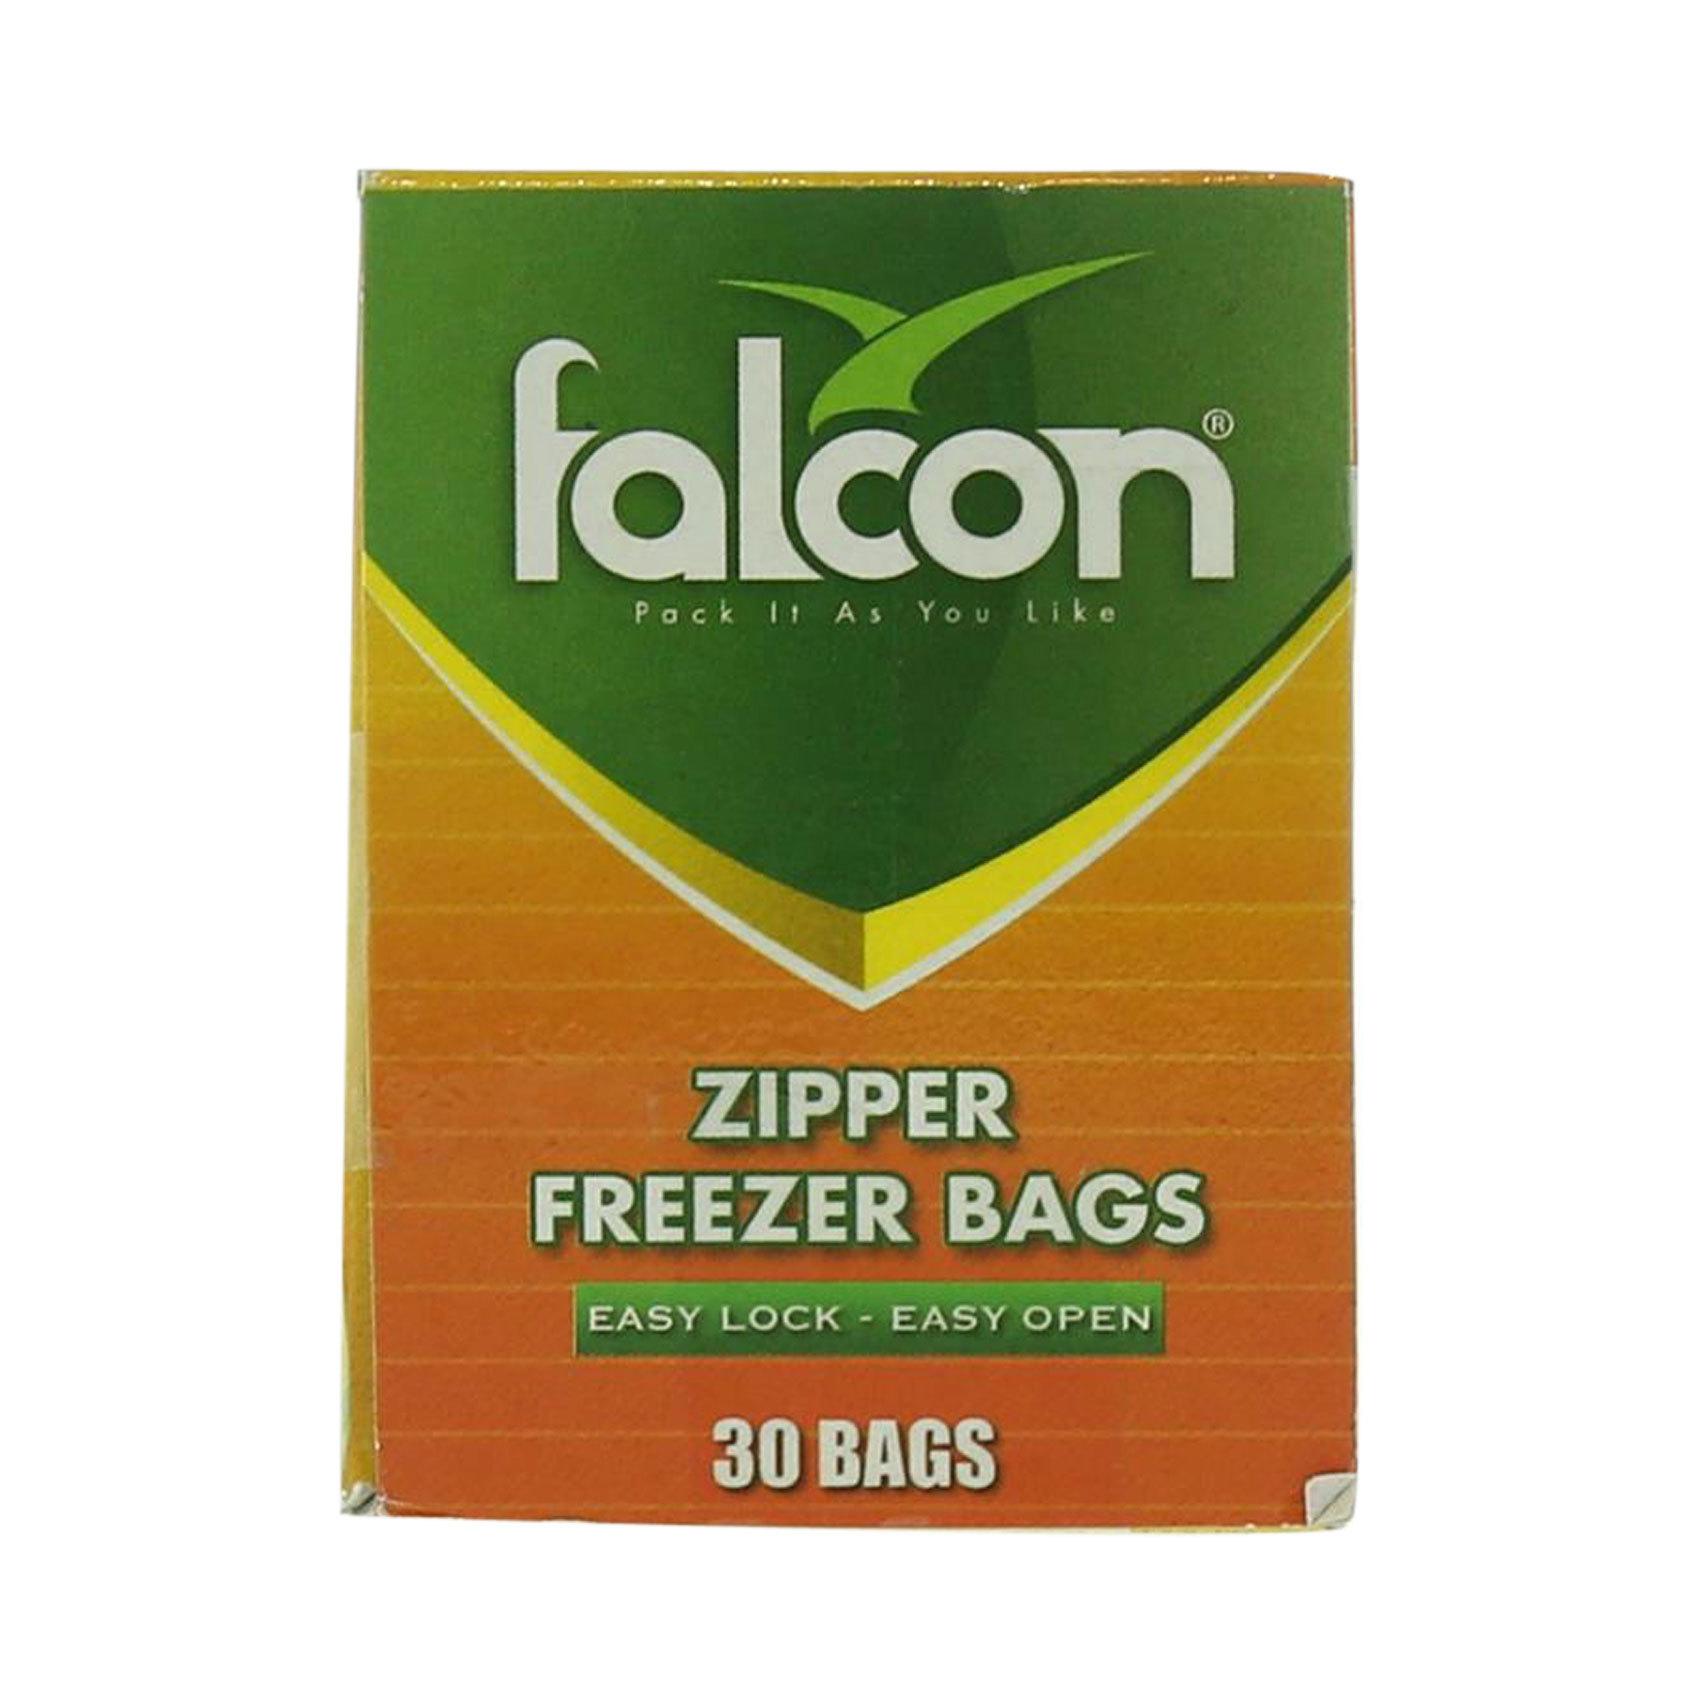 FALCON FR BAG ZIPPER 30X40CM